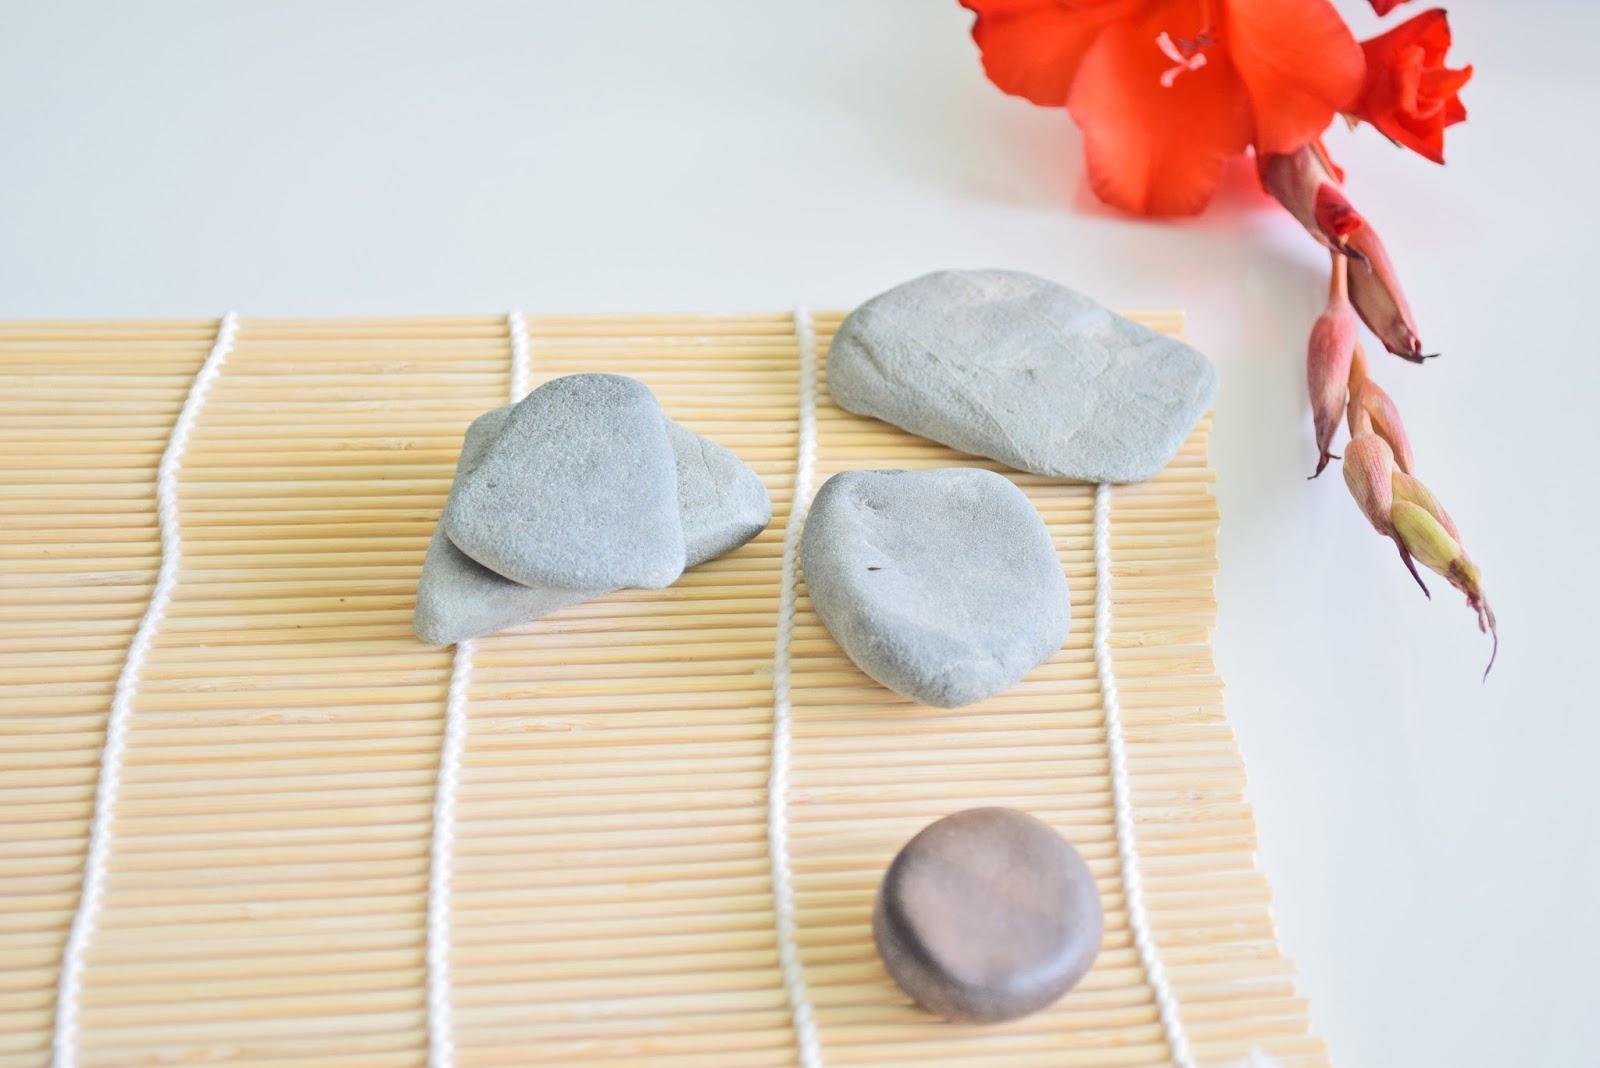 stones diy